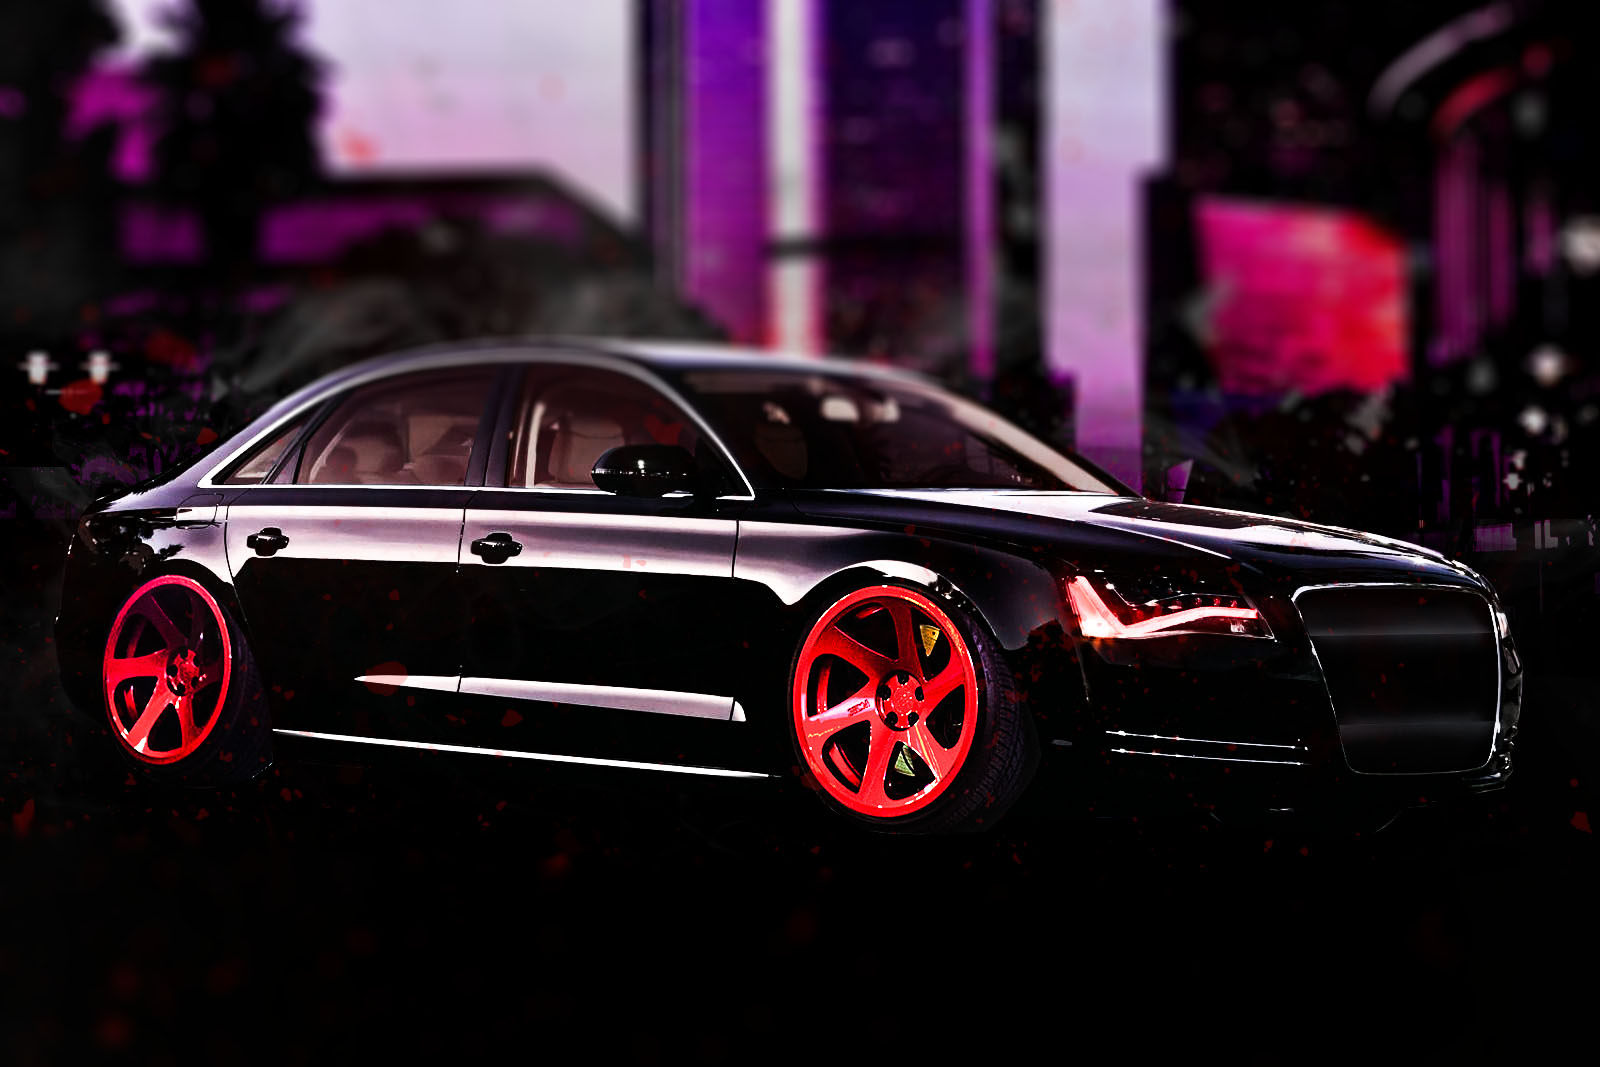 Audi A8 Slammed On Rotiform Rims